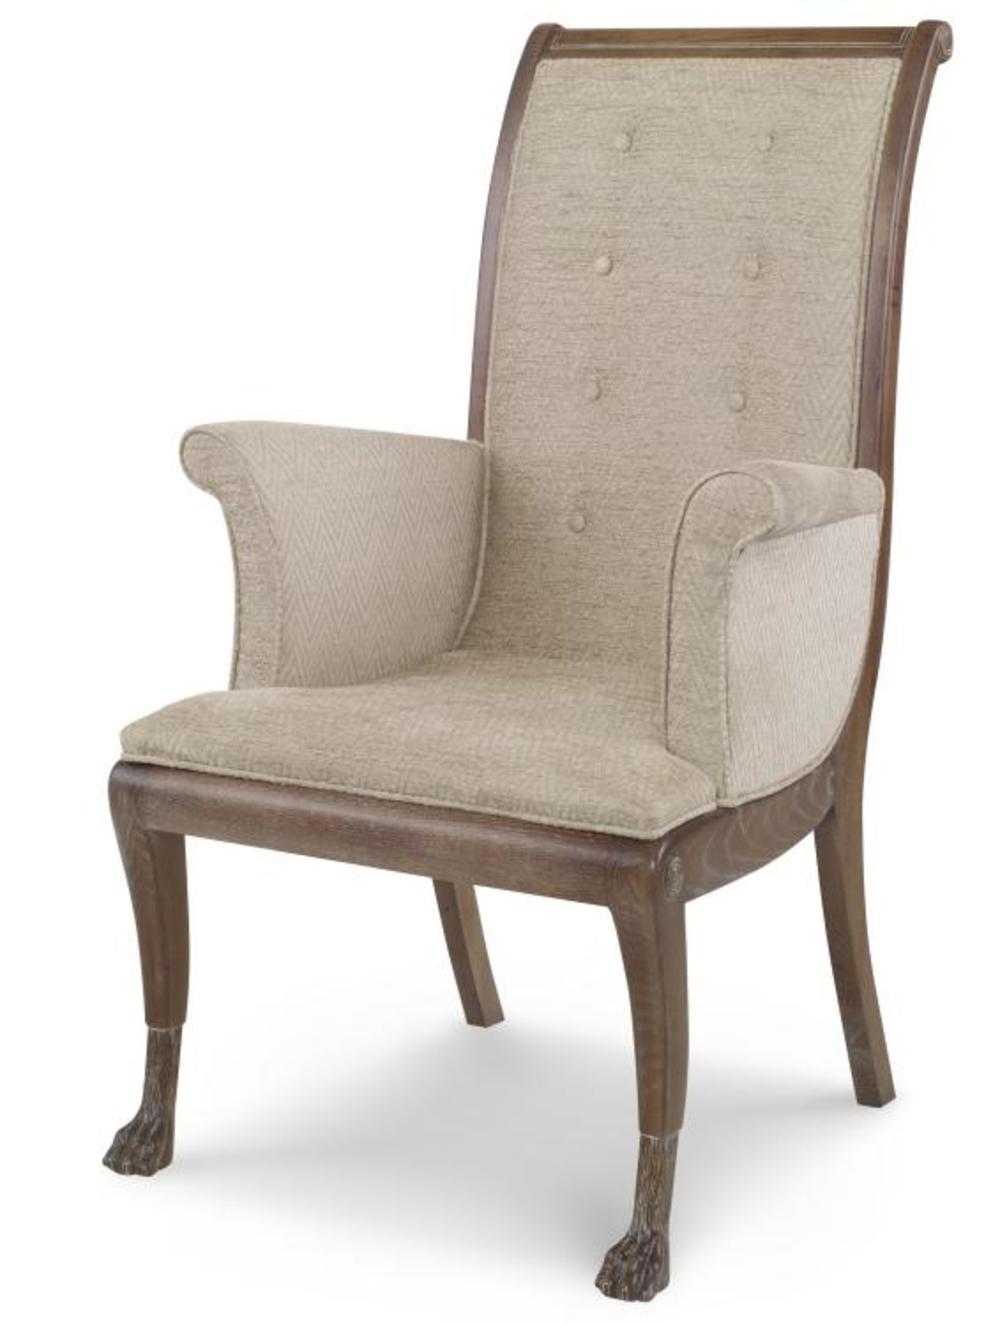 Century Furniture - Duncan Arm Chair